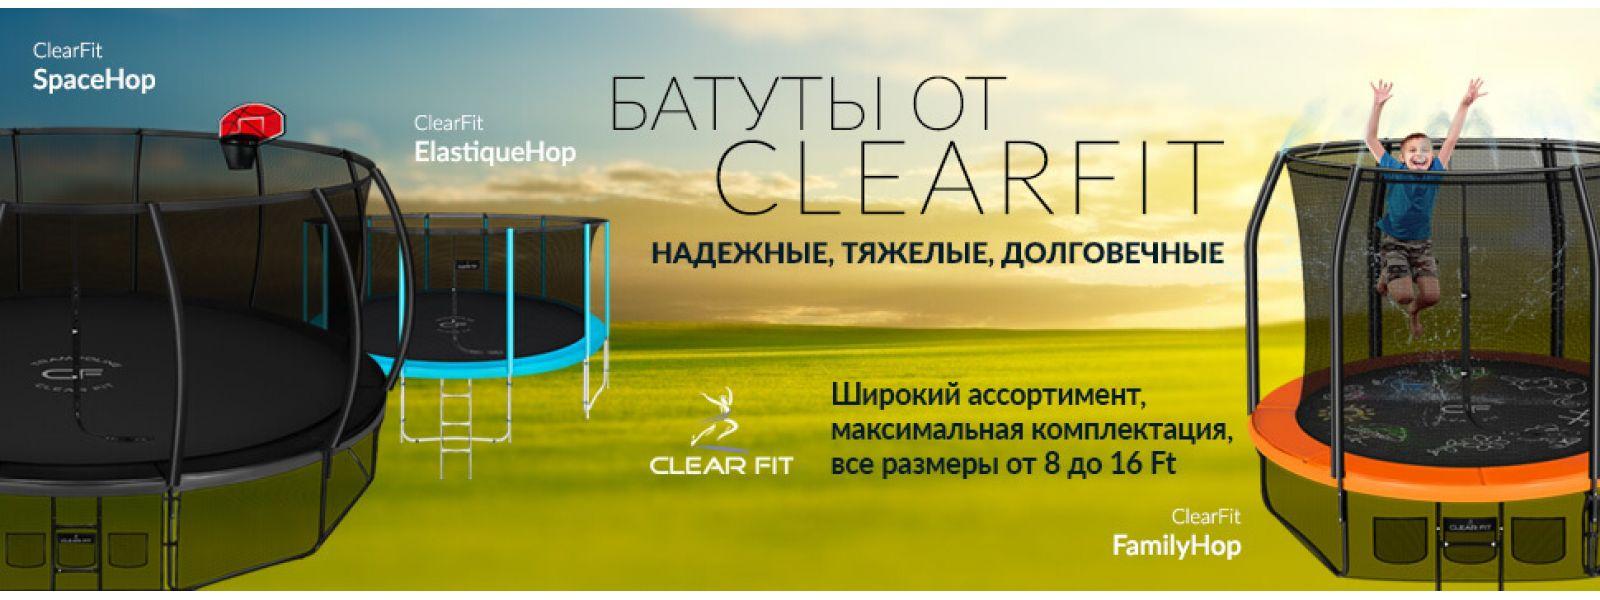 Батуты ClearFit-акция